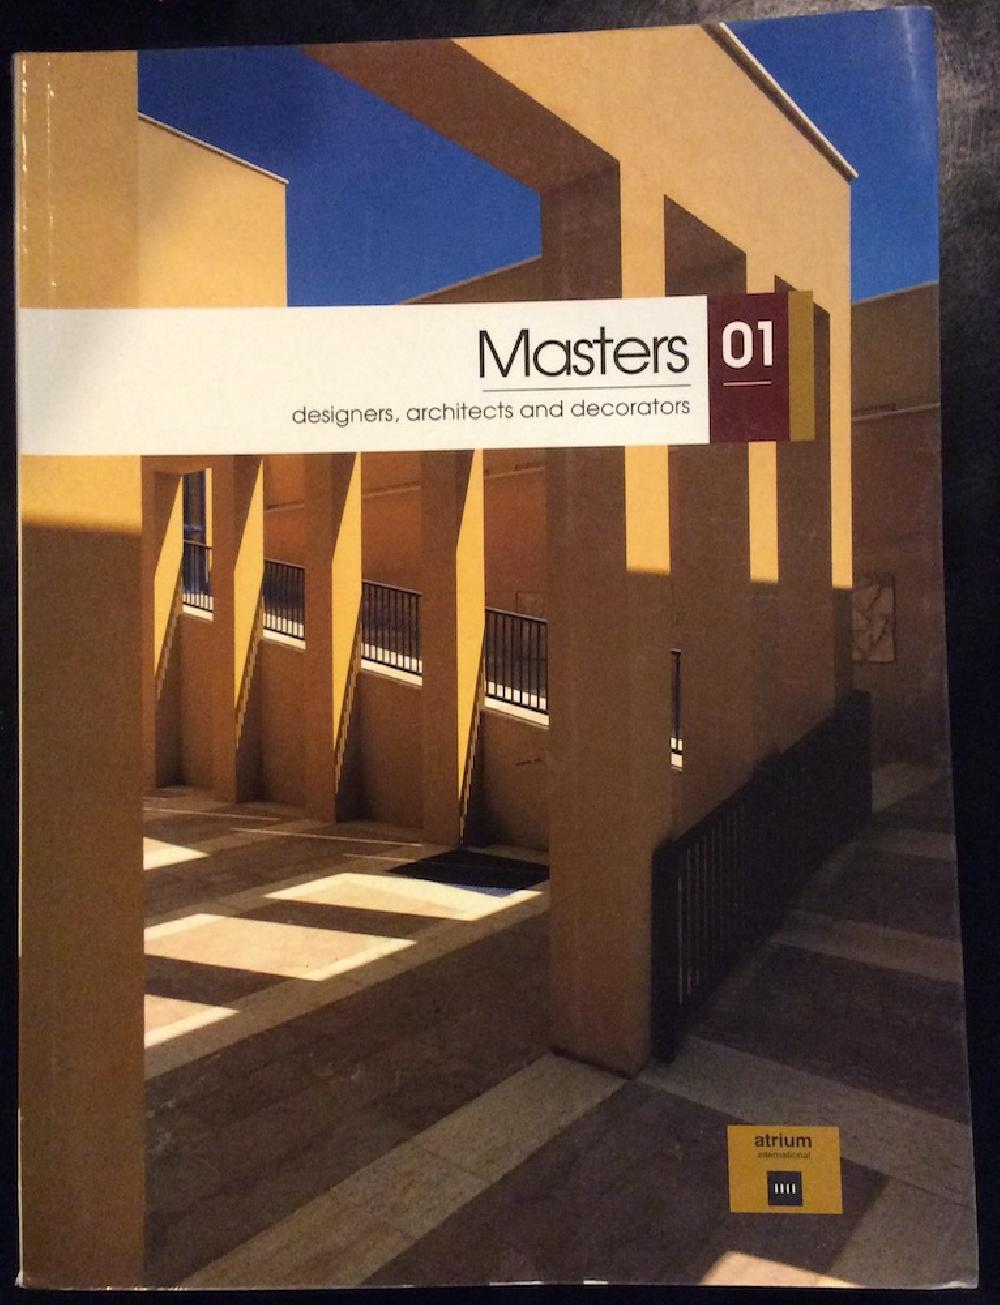 Masters 01